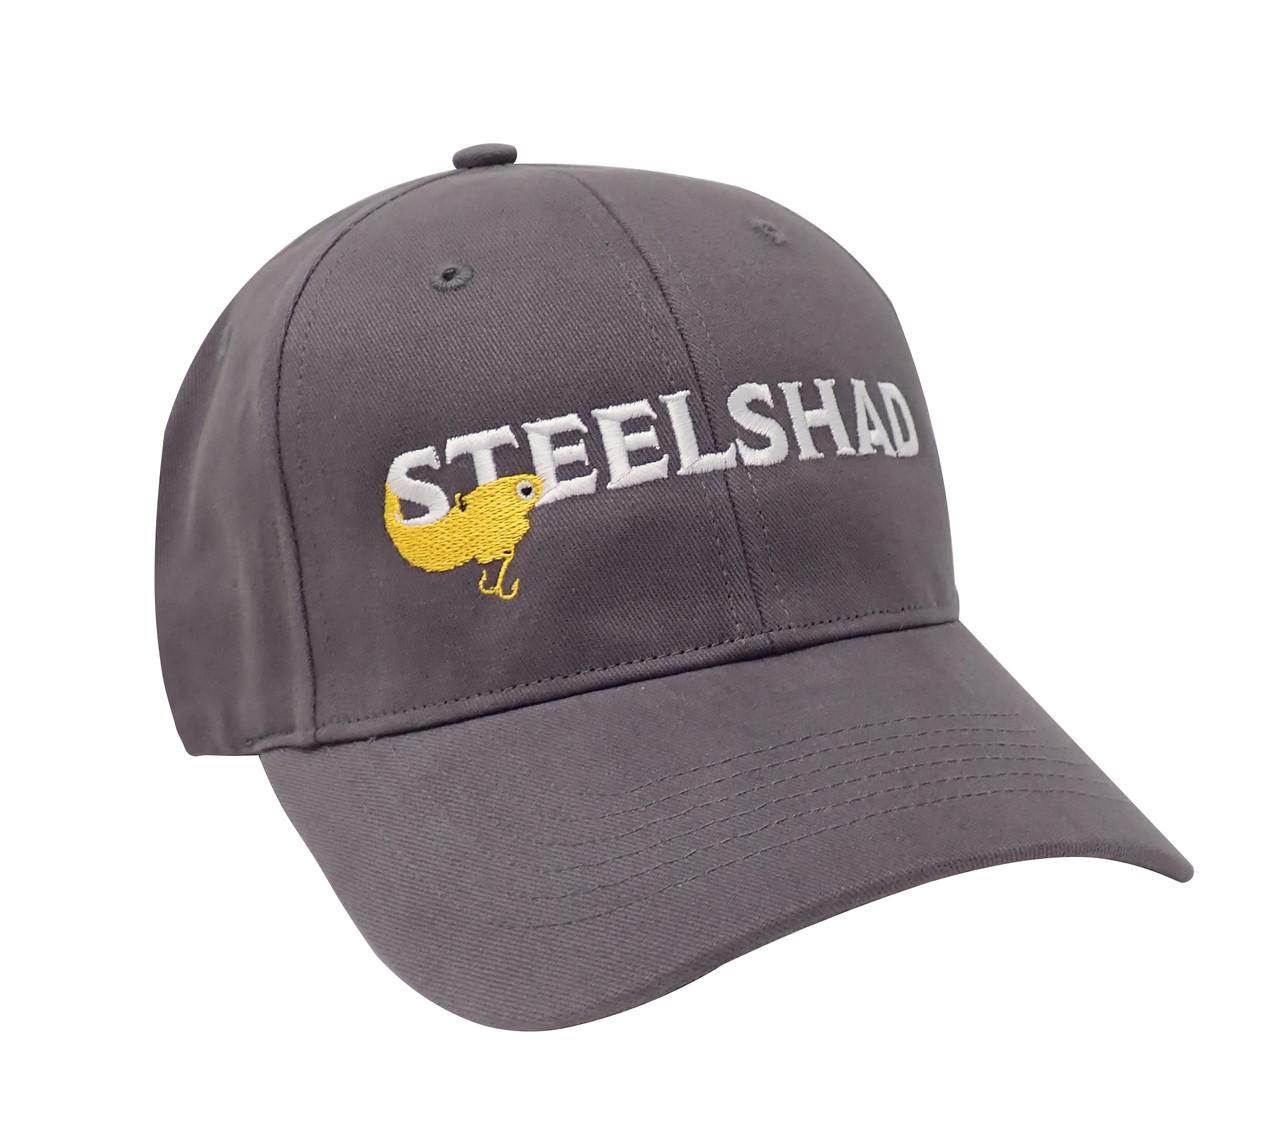 SteelShad Hat - Gray Twill - White Logo/Yellow Lure